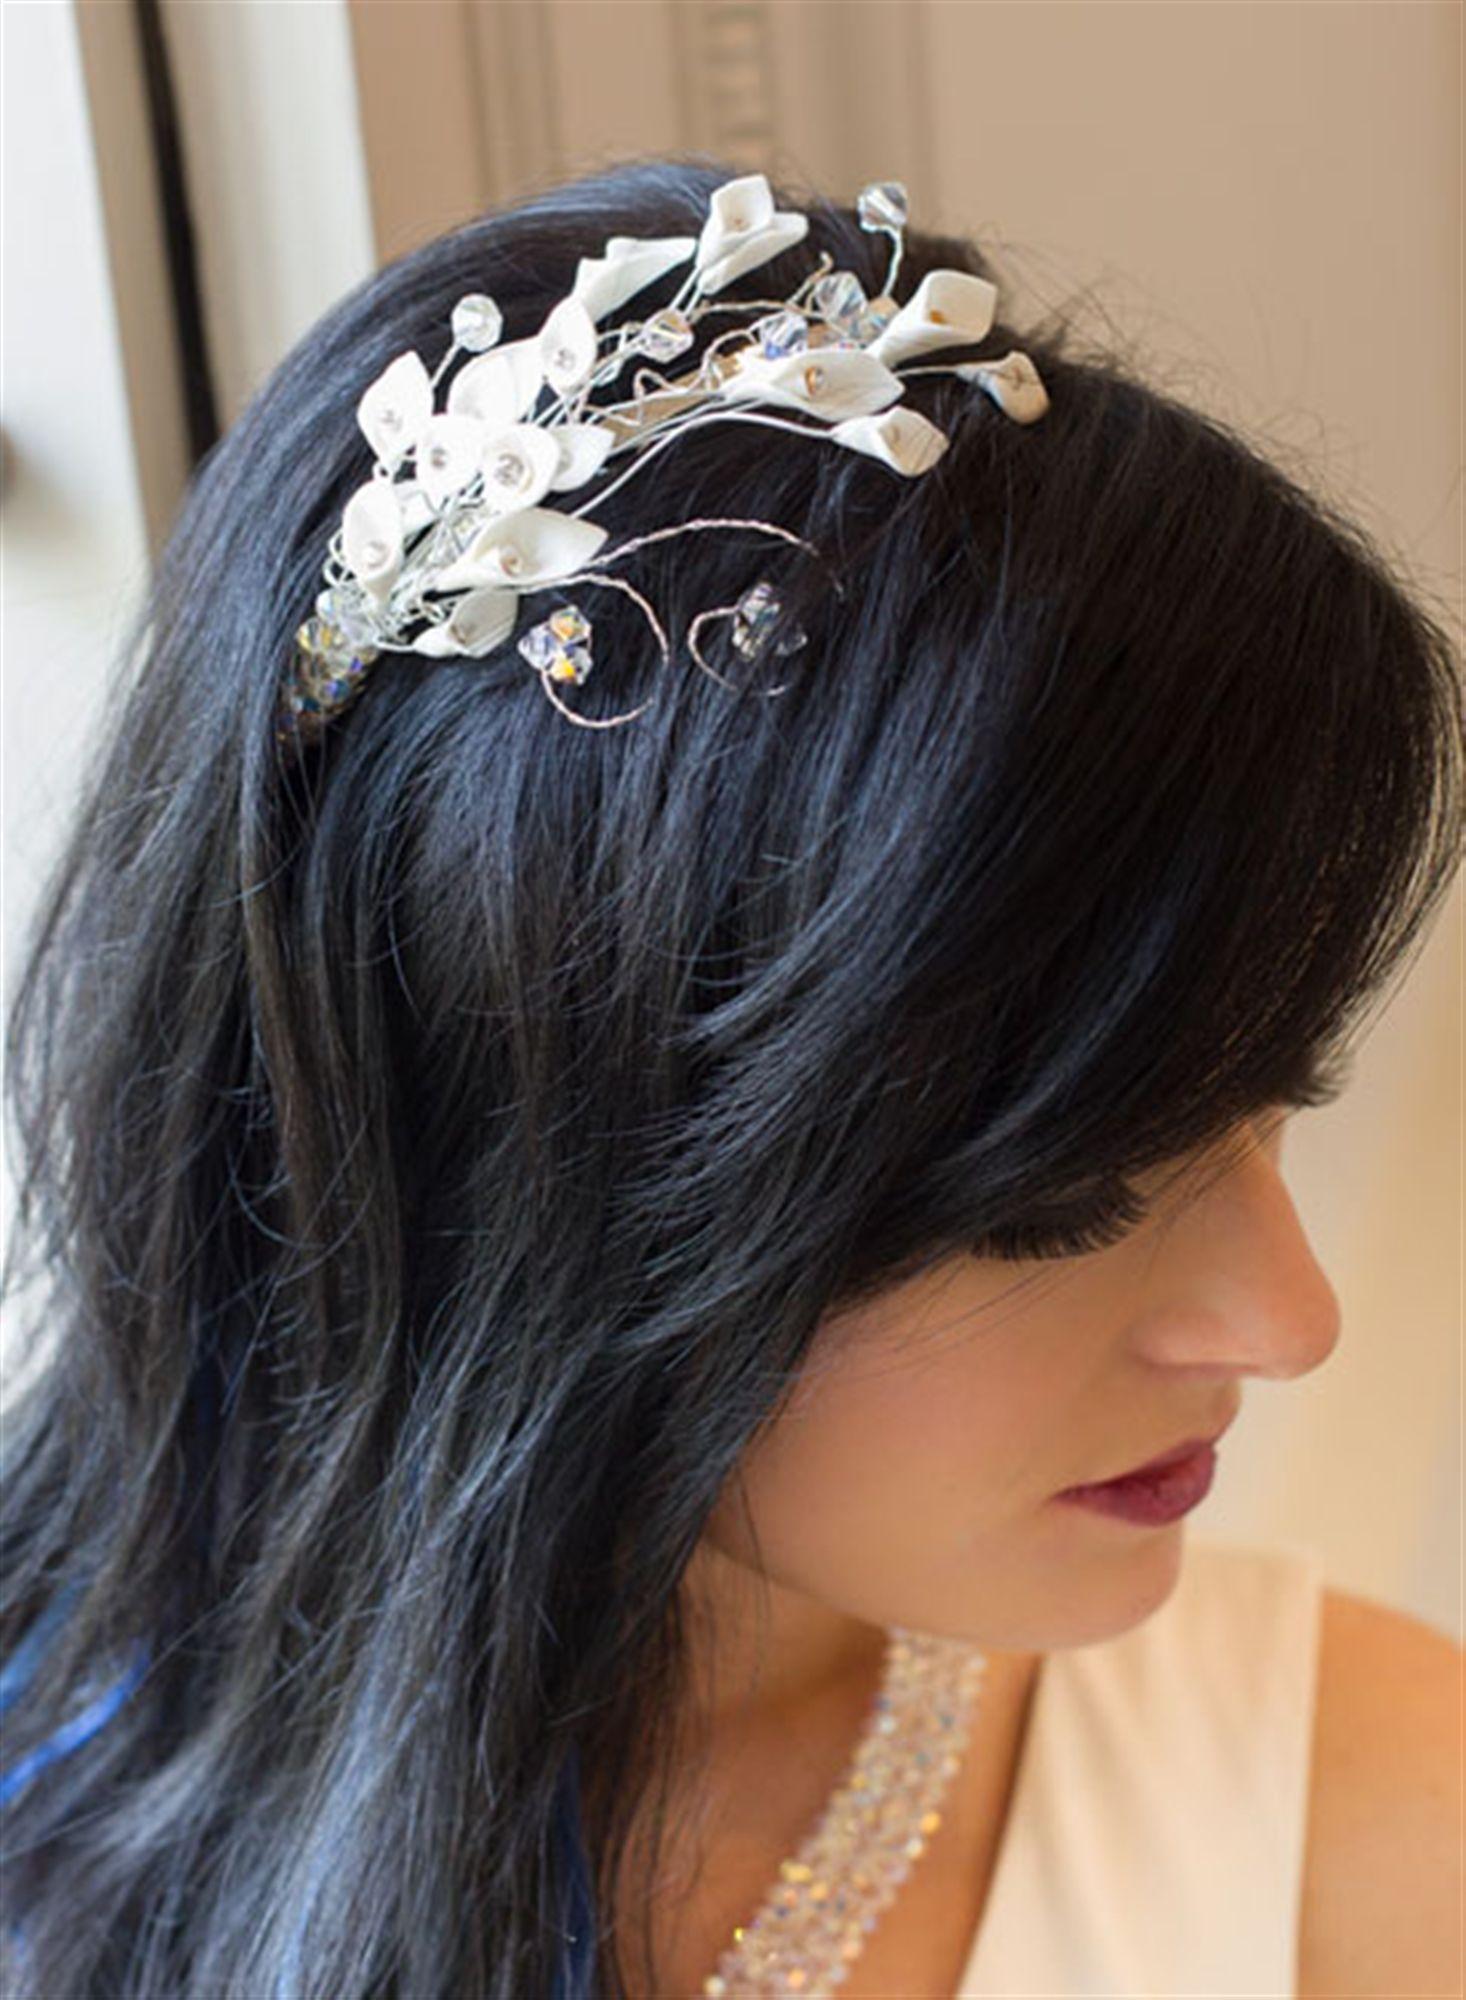 brides tiara/ bridesmaids tiara/ bridal tiara/ wedding tiara